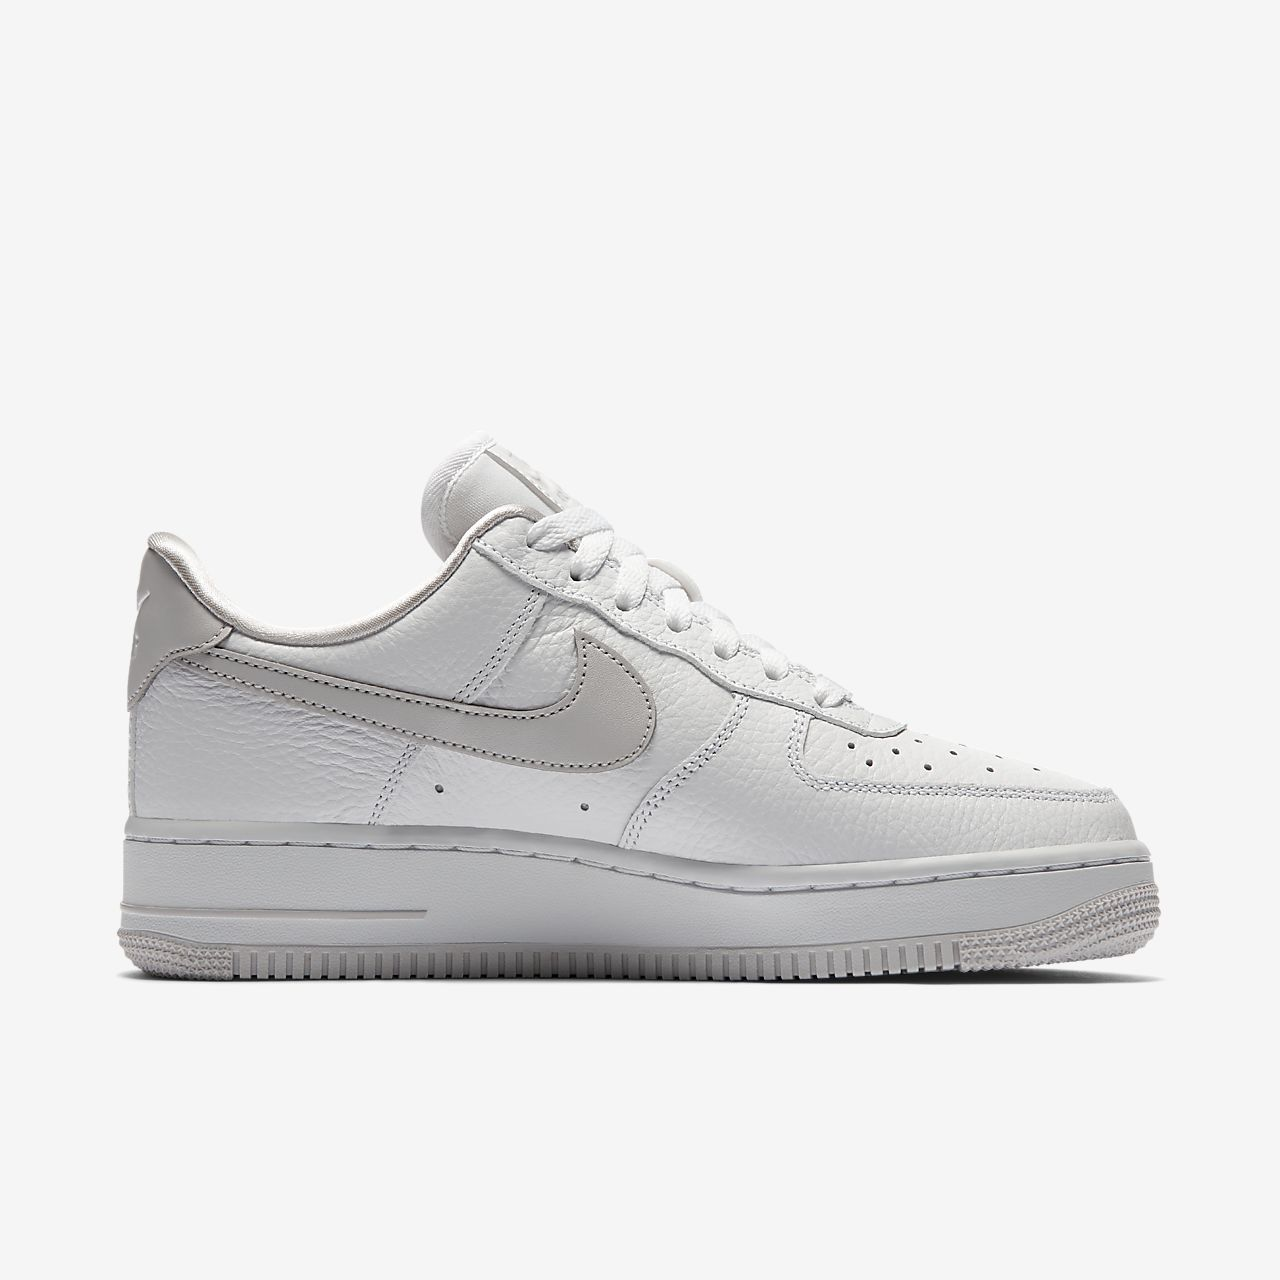 promo code 67326 8f9f4 ... greece nike sportswear nike air force 107 ess zapatillas black white  04dcd 6b7a9